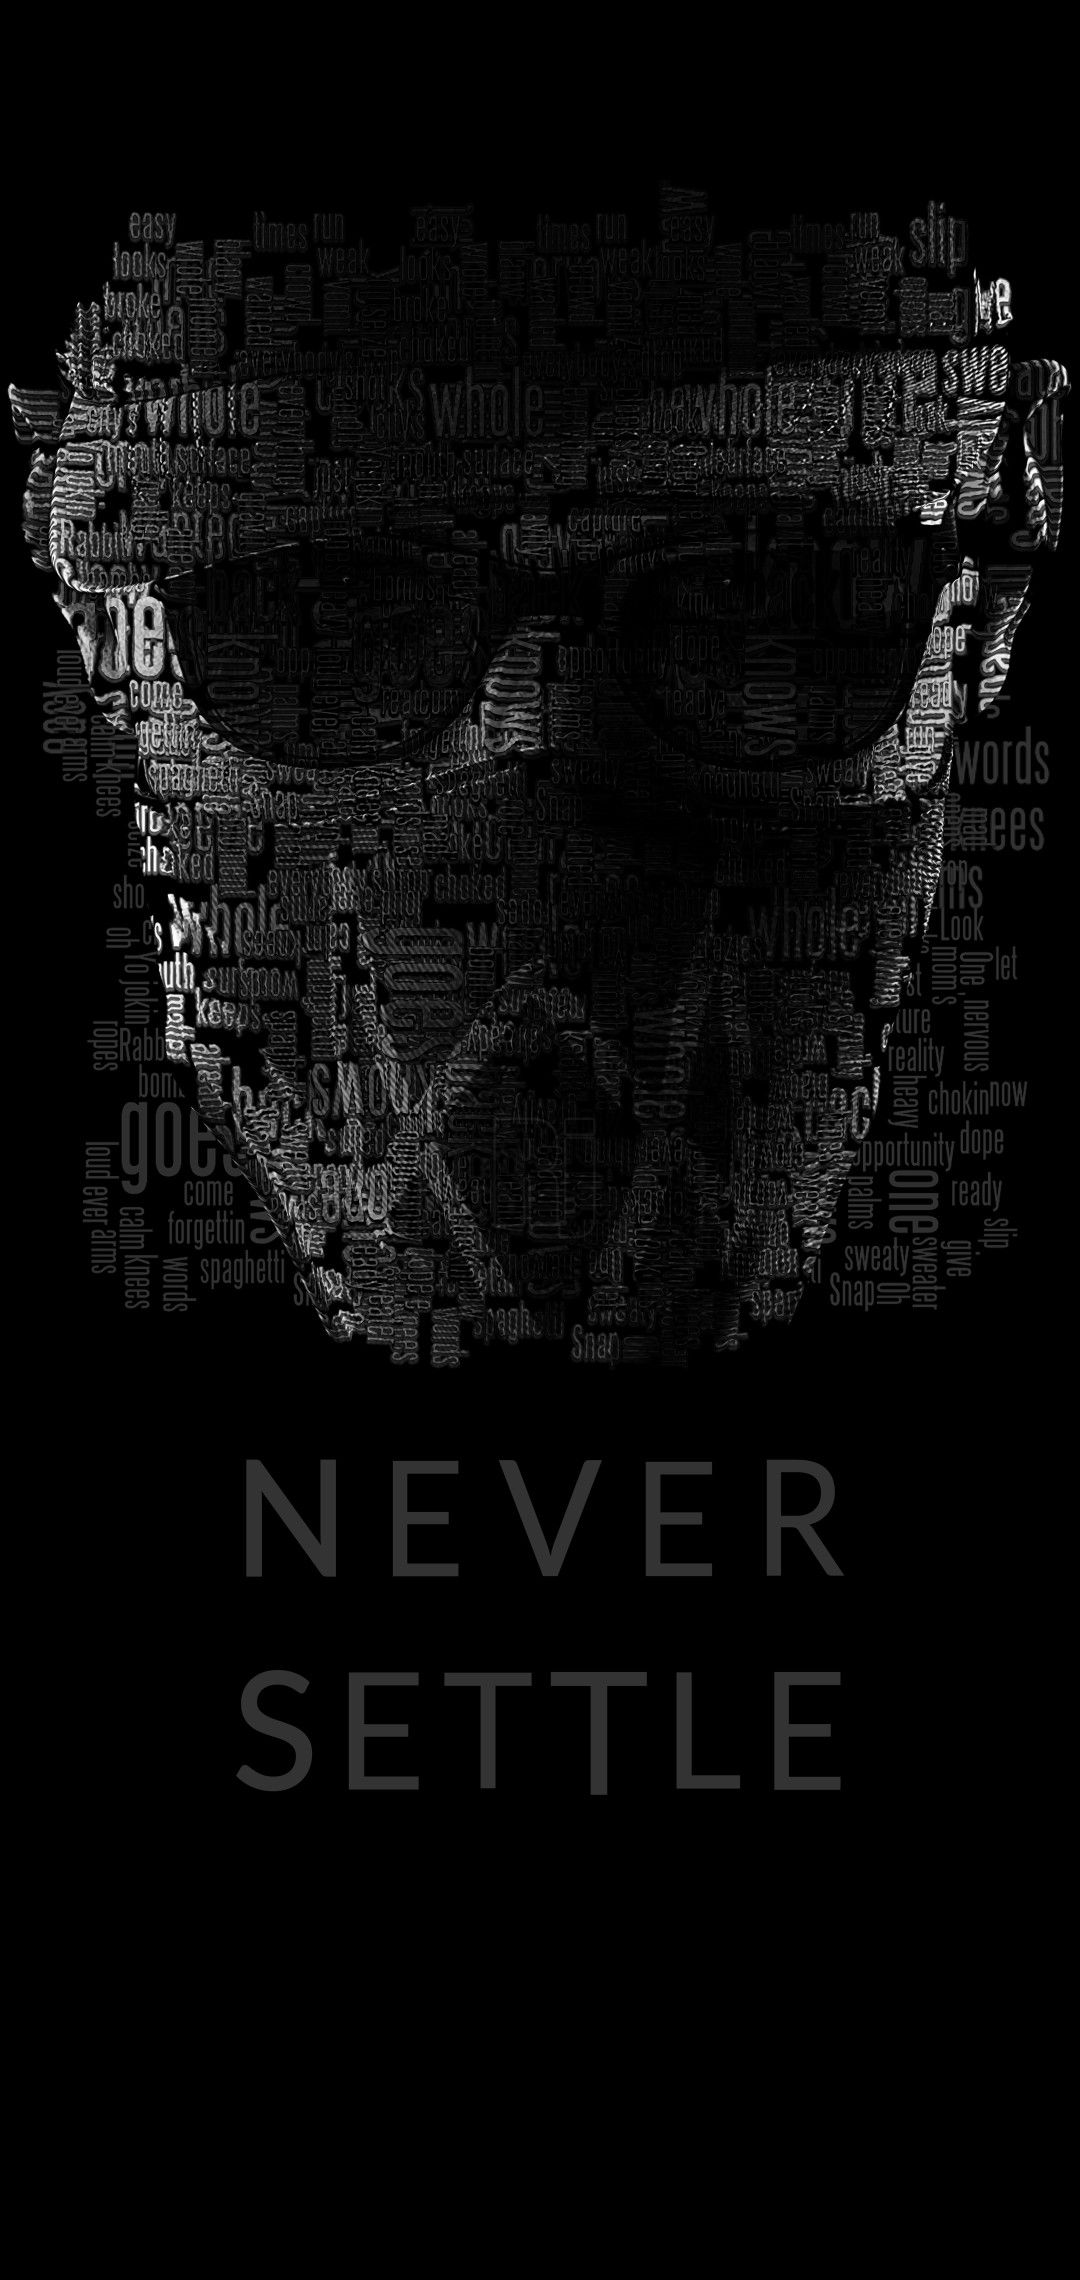 Never Settle (Watchdogs) Wallpaper // Never Settle